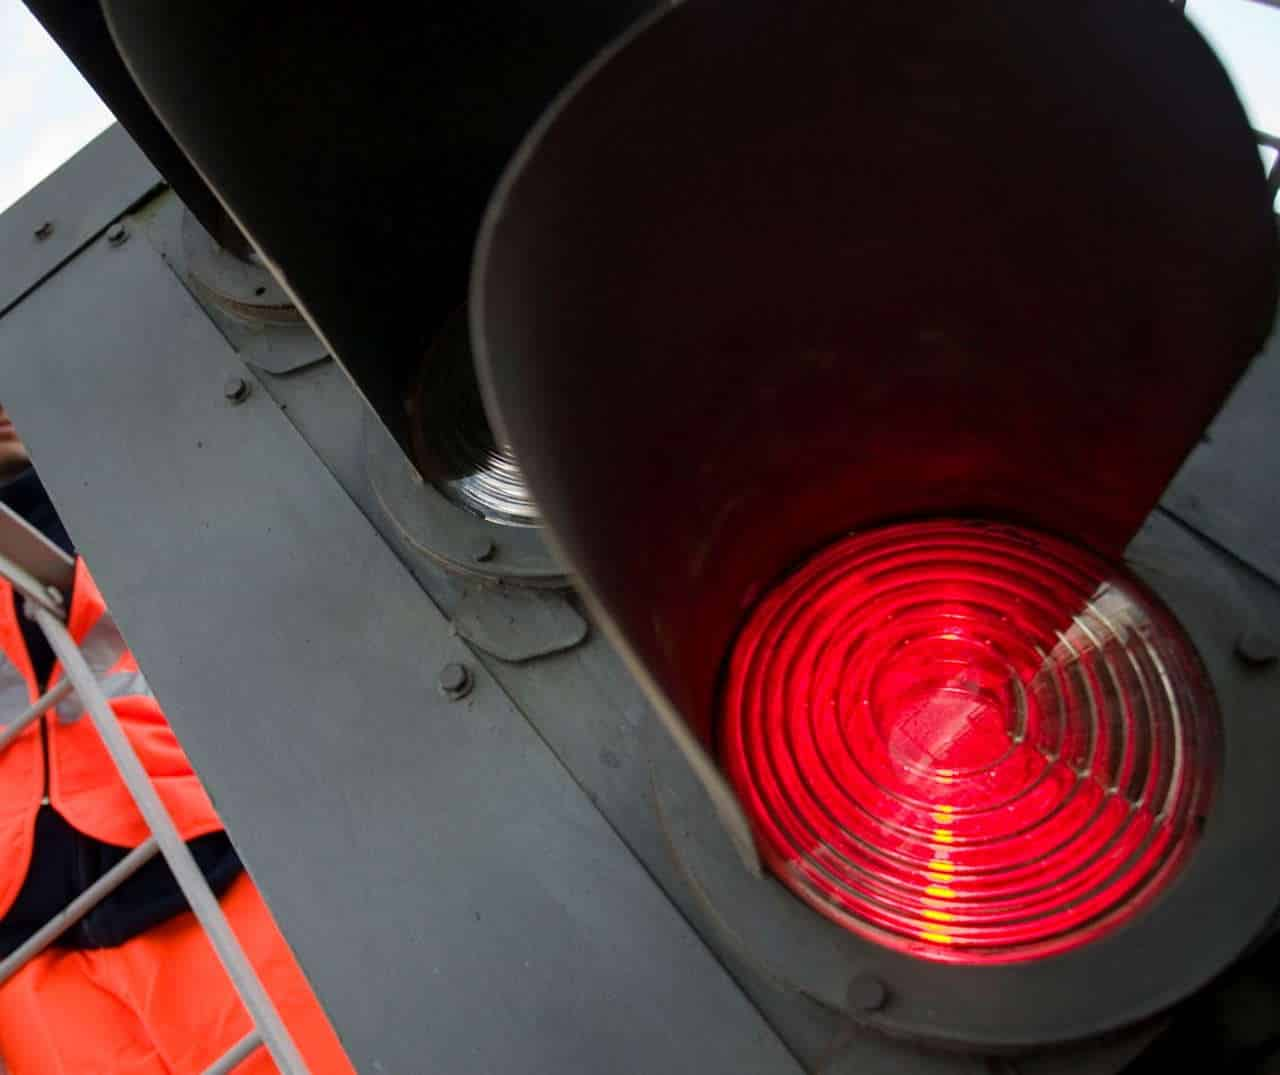 Red light for danger Hither Green Signalling Upgrade